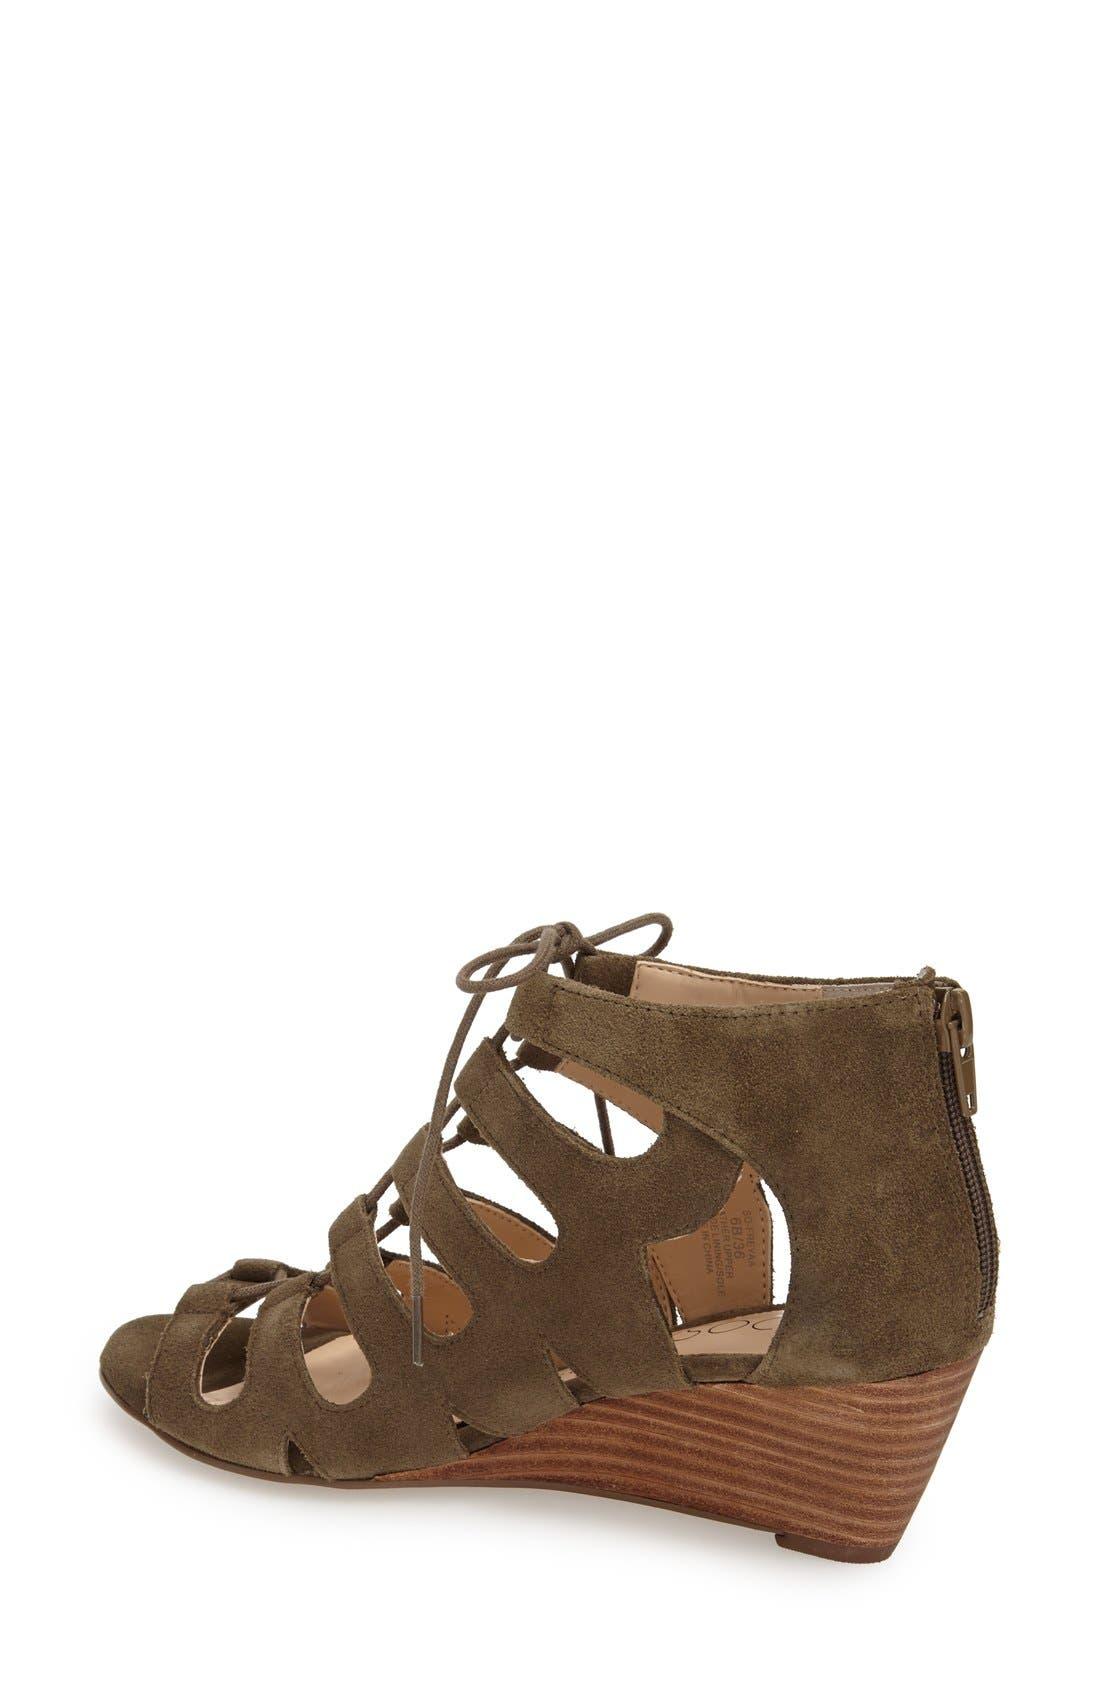 Alternate Image 2  - Sole Society 'Freyaa' Wedge Sandal (Women)